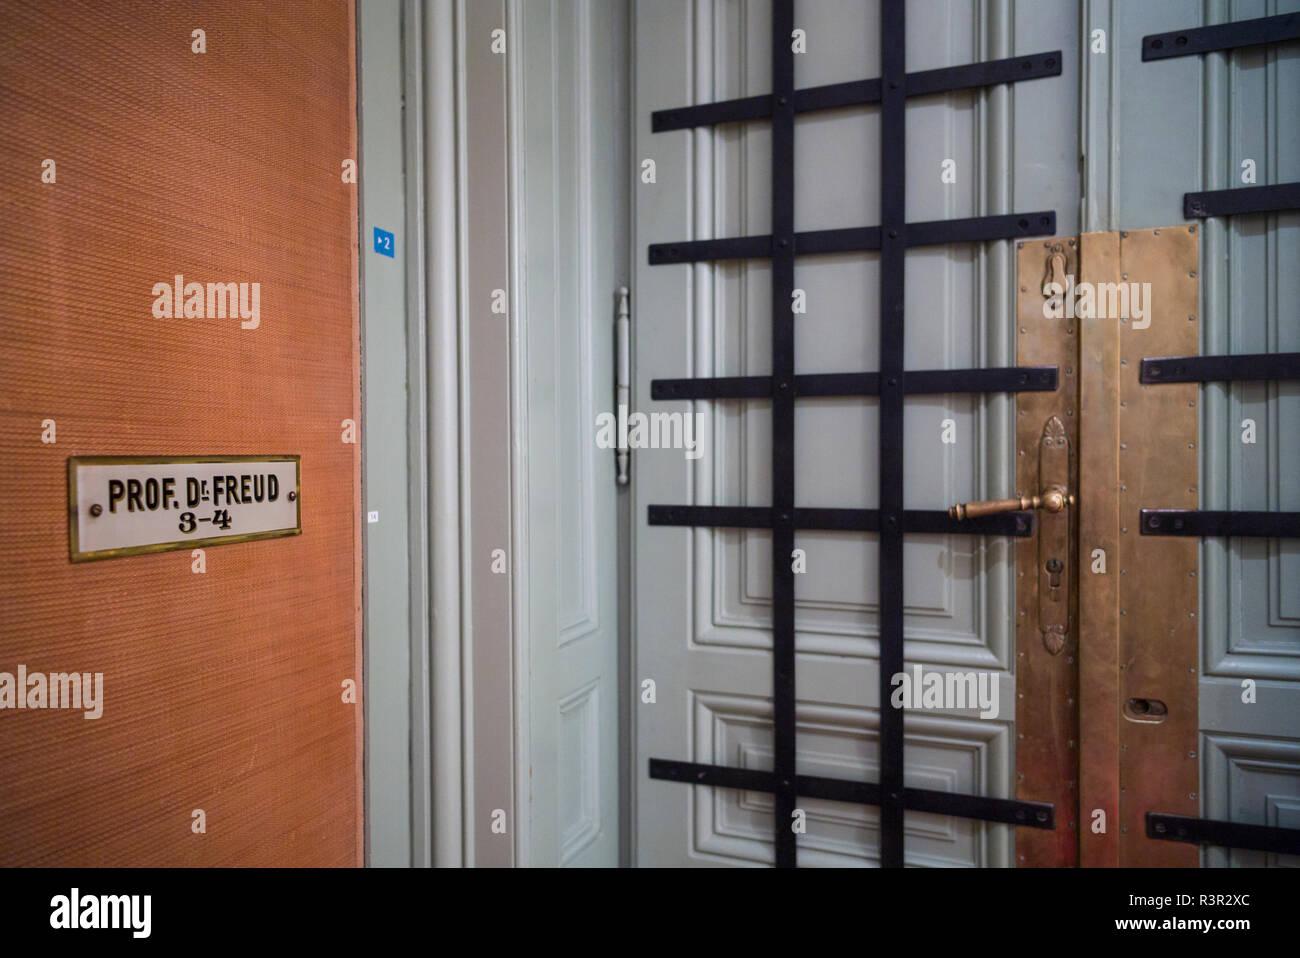 Austria, Vienna, Sigmund Freud Museum interior (Editorial Use Only) - Stock Image